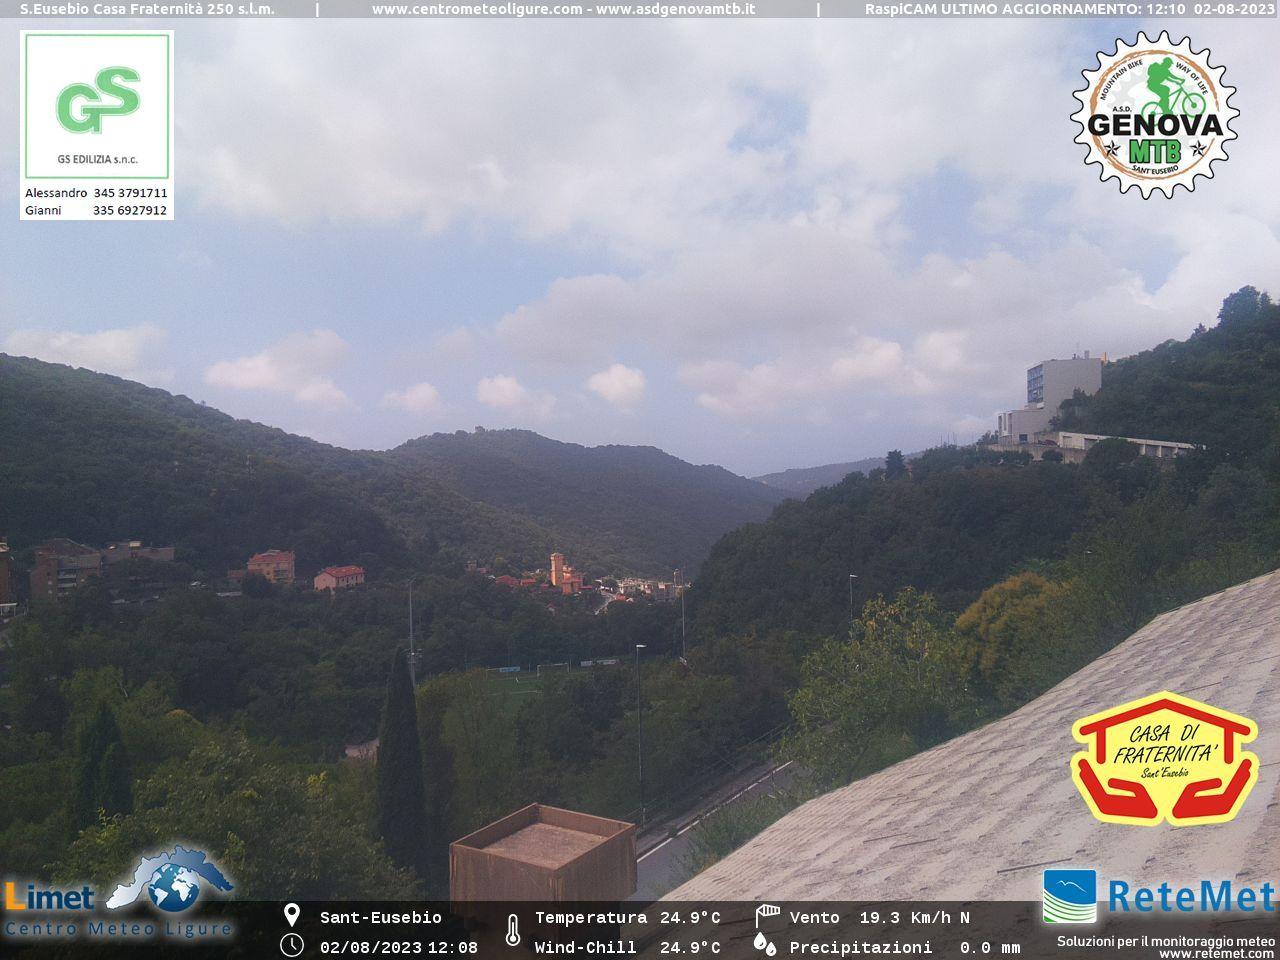 "Webcam Casa di Fraternità Sant'Eusebio"" width="